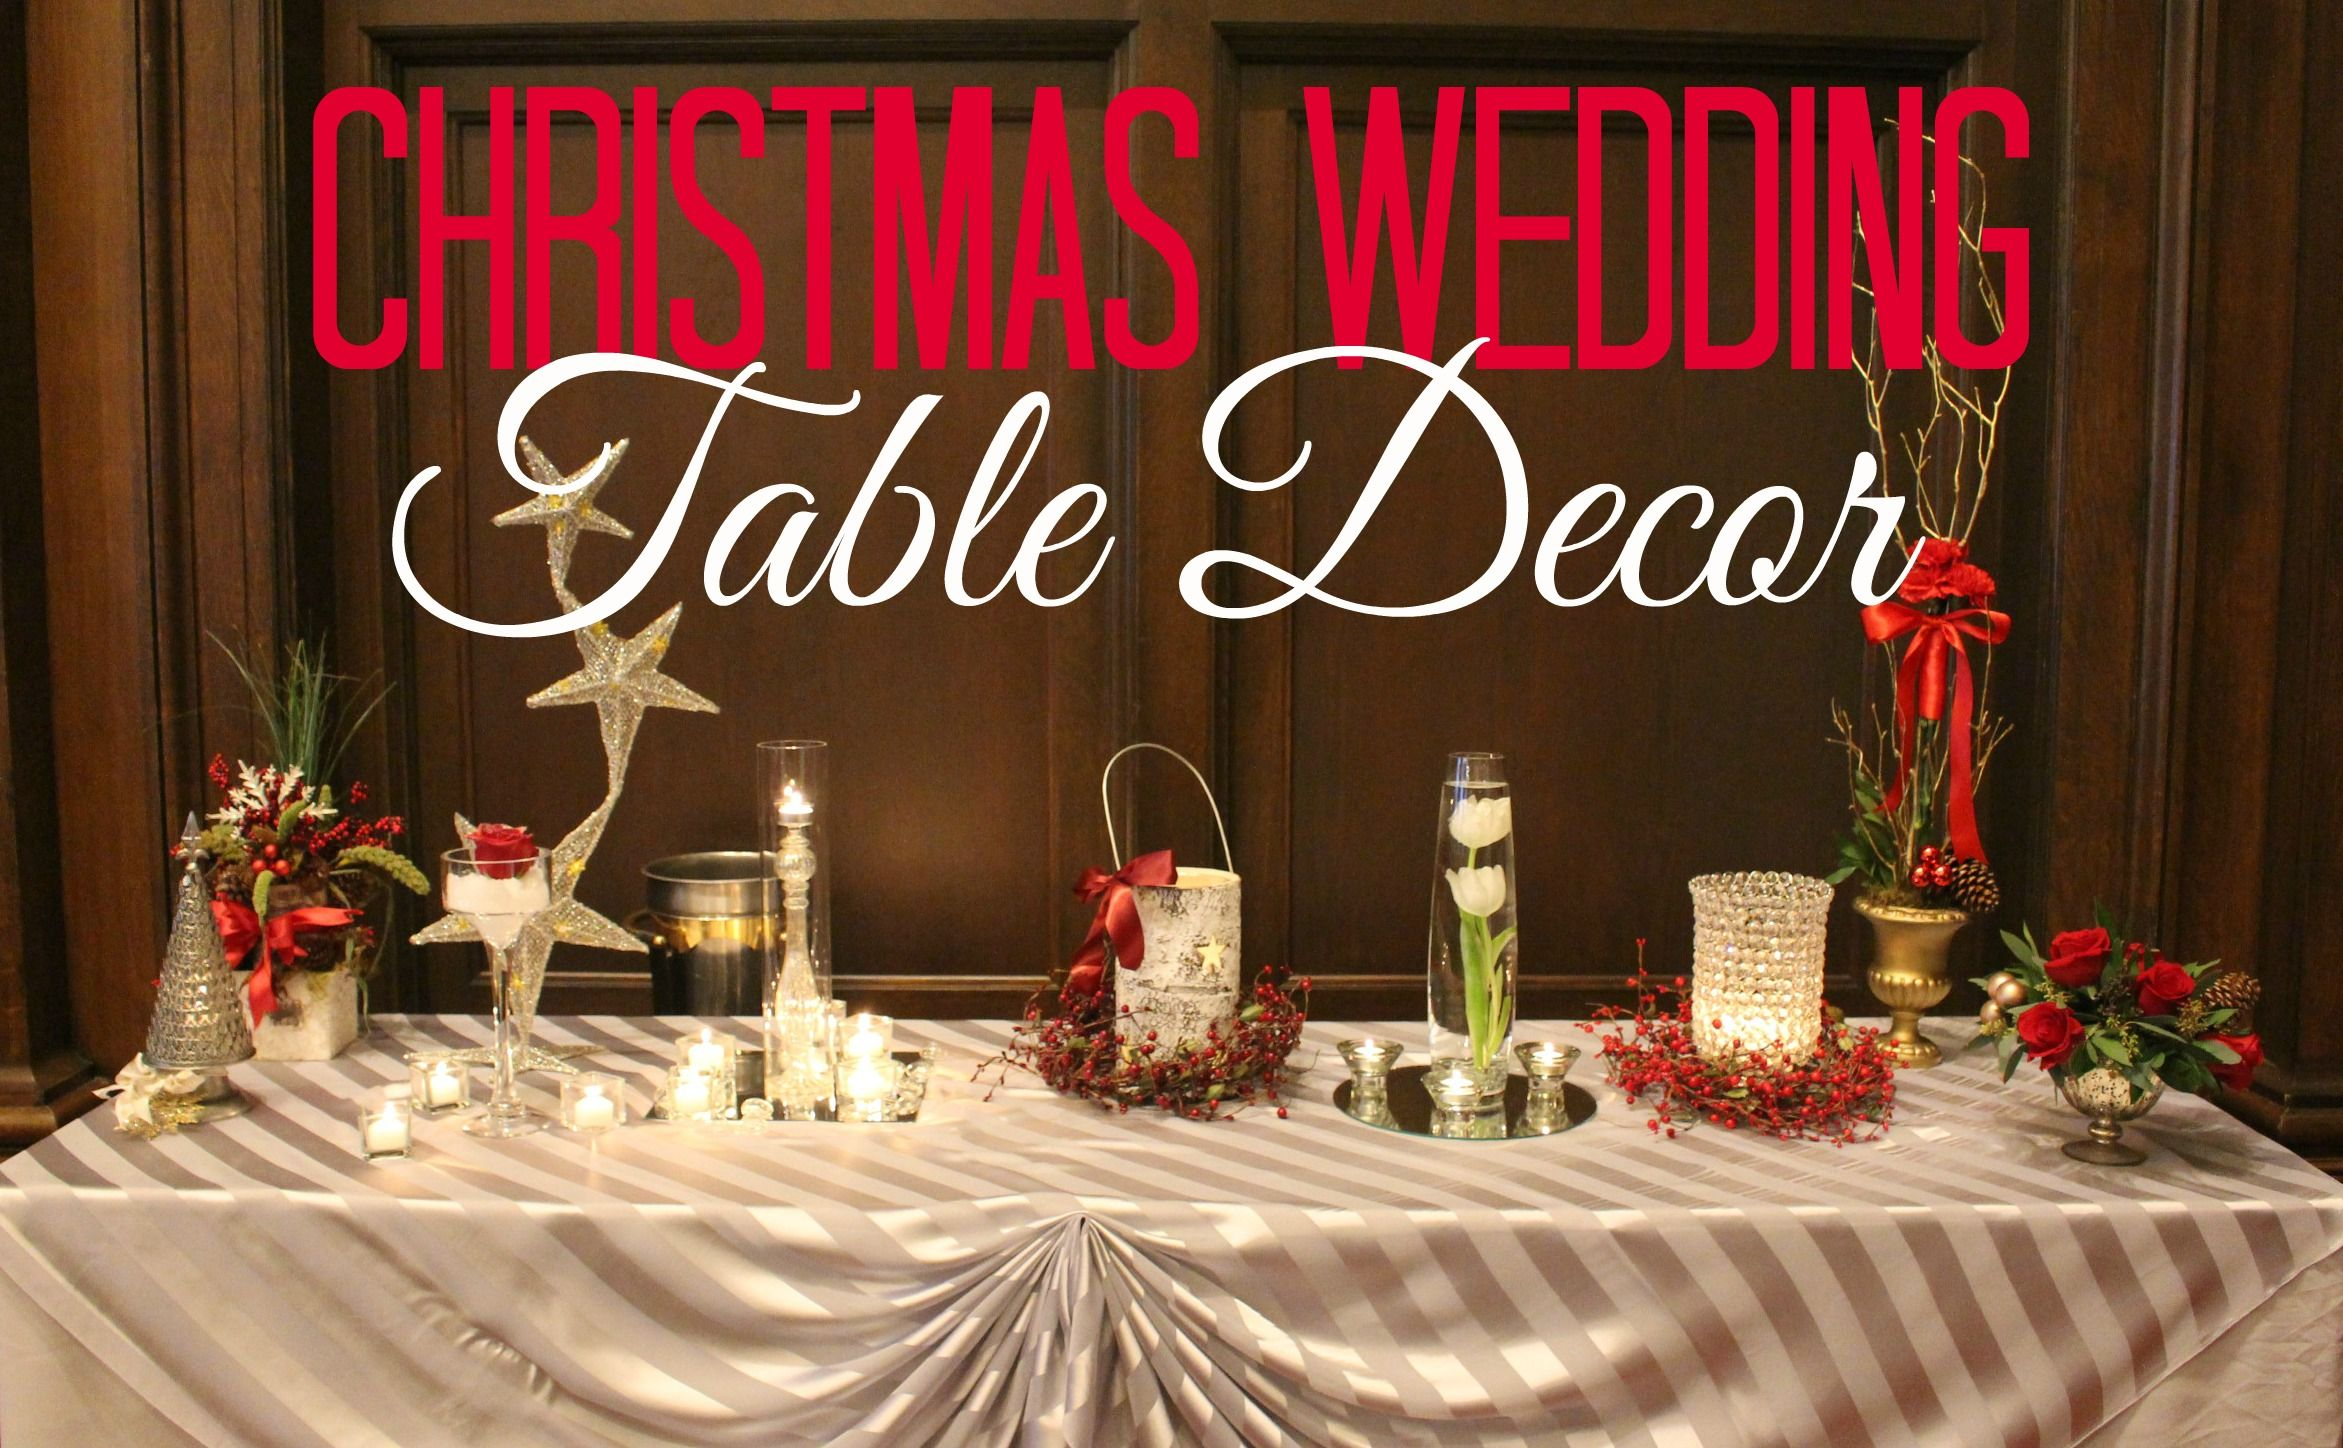 Wedding Table Decorations Christmas Wedding Table Christmas Wedding Wedding Reception Tables